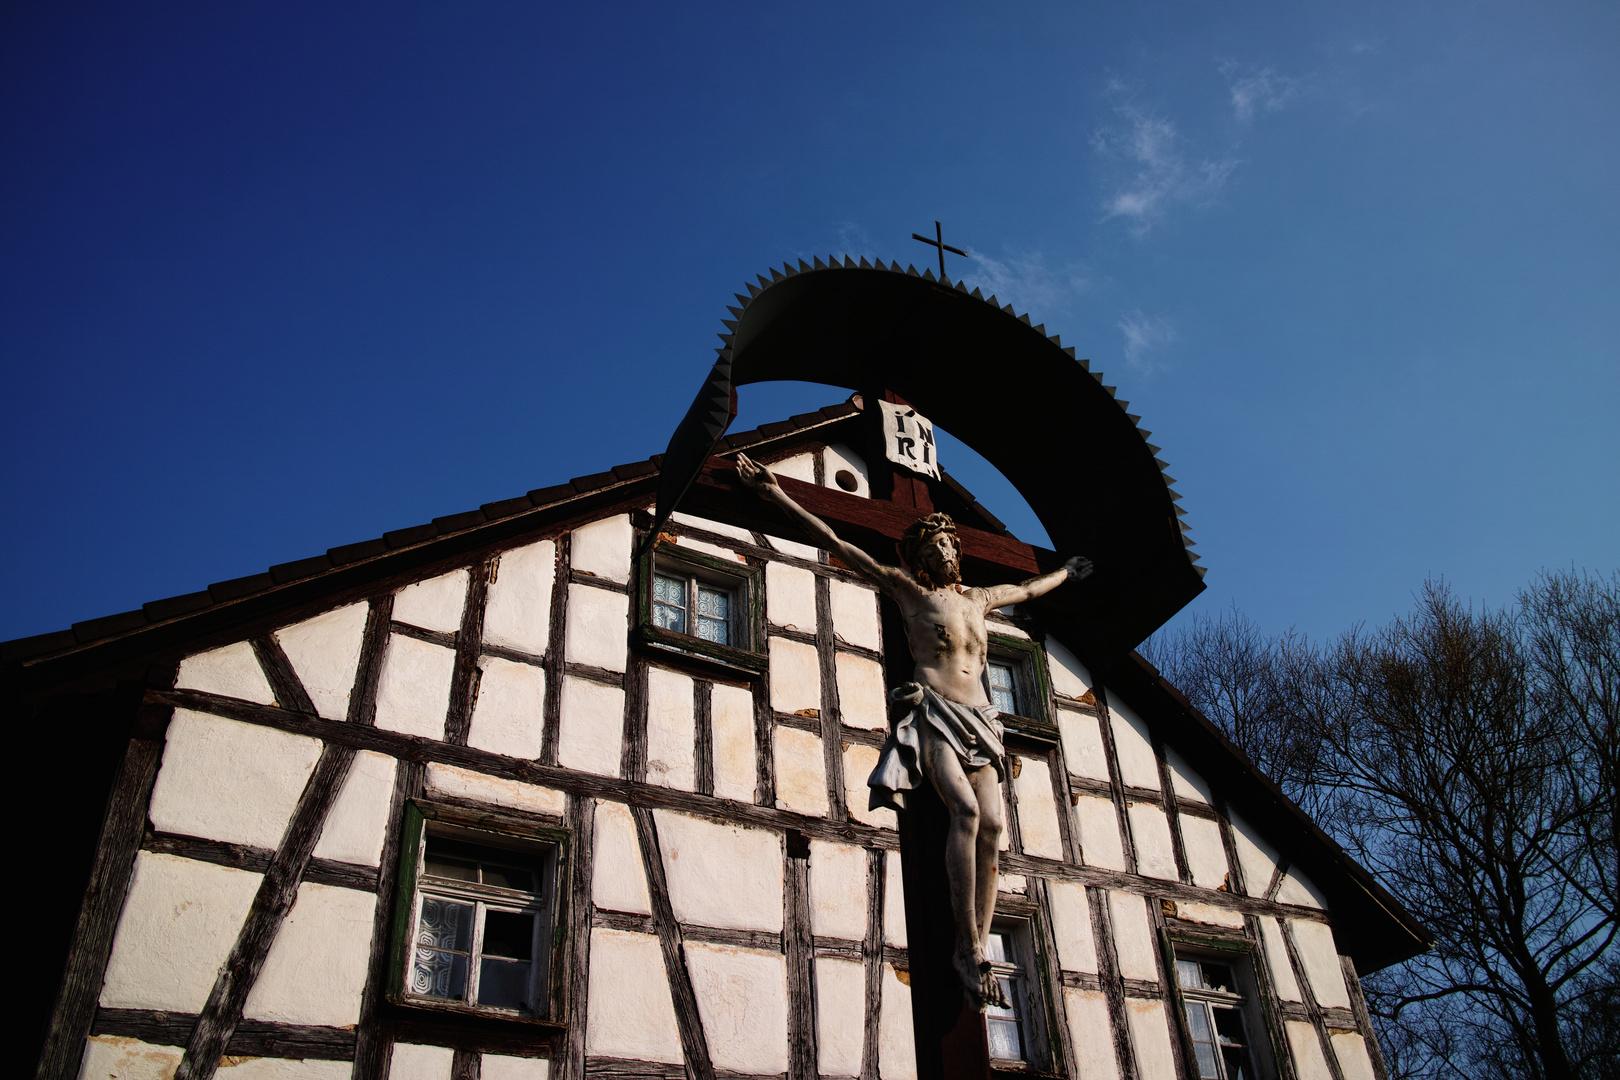 Dorfkreuz in Püttlach